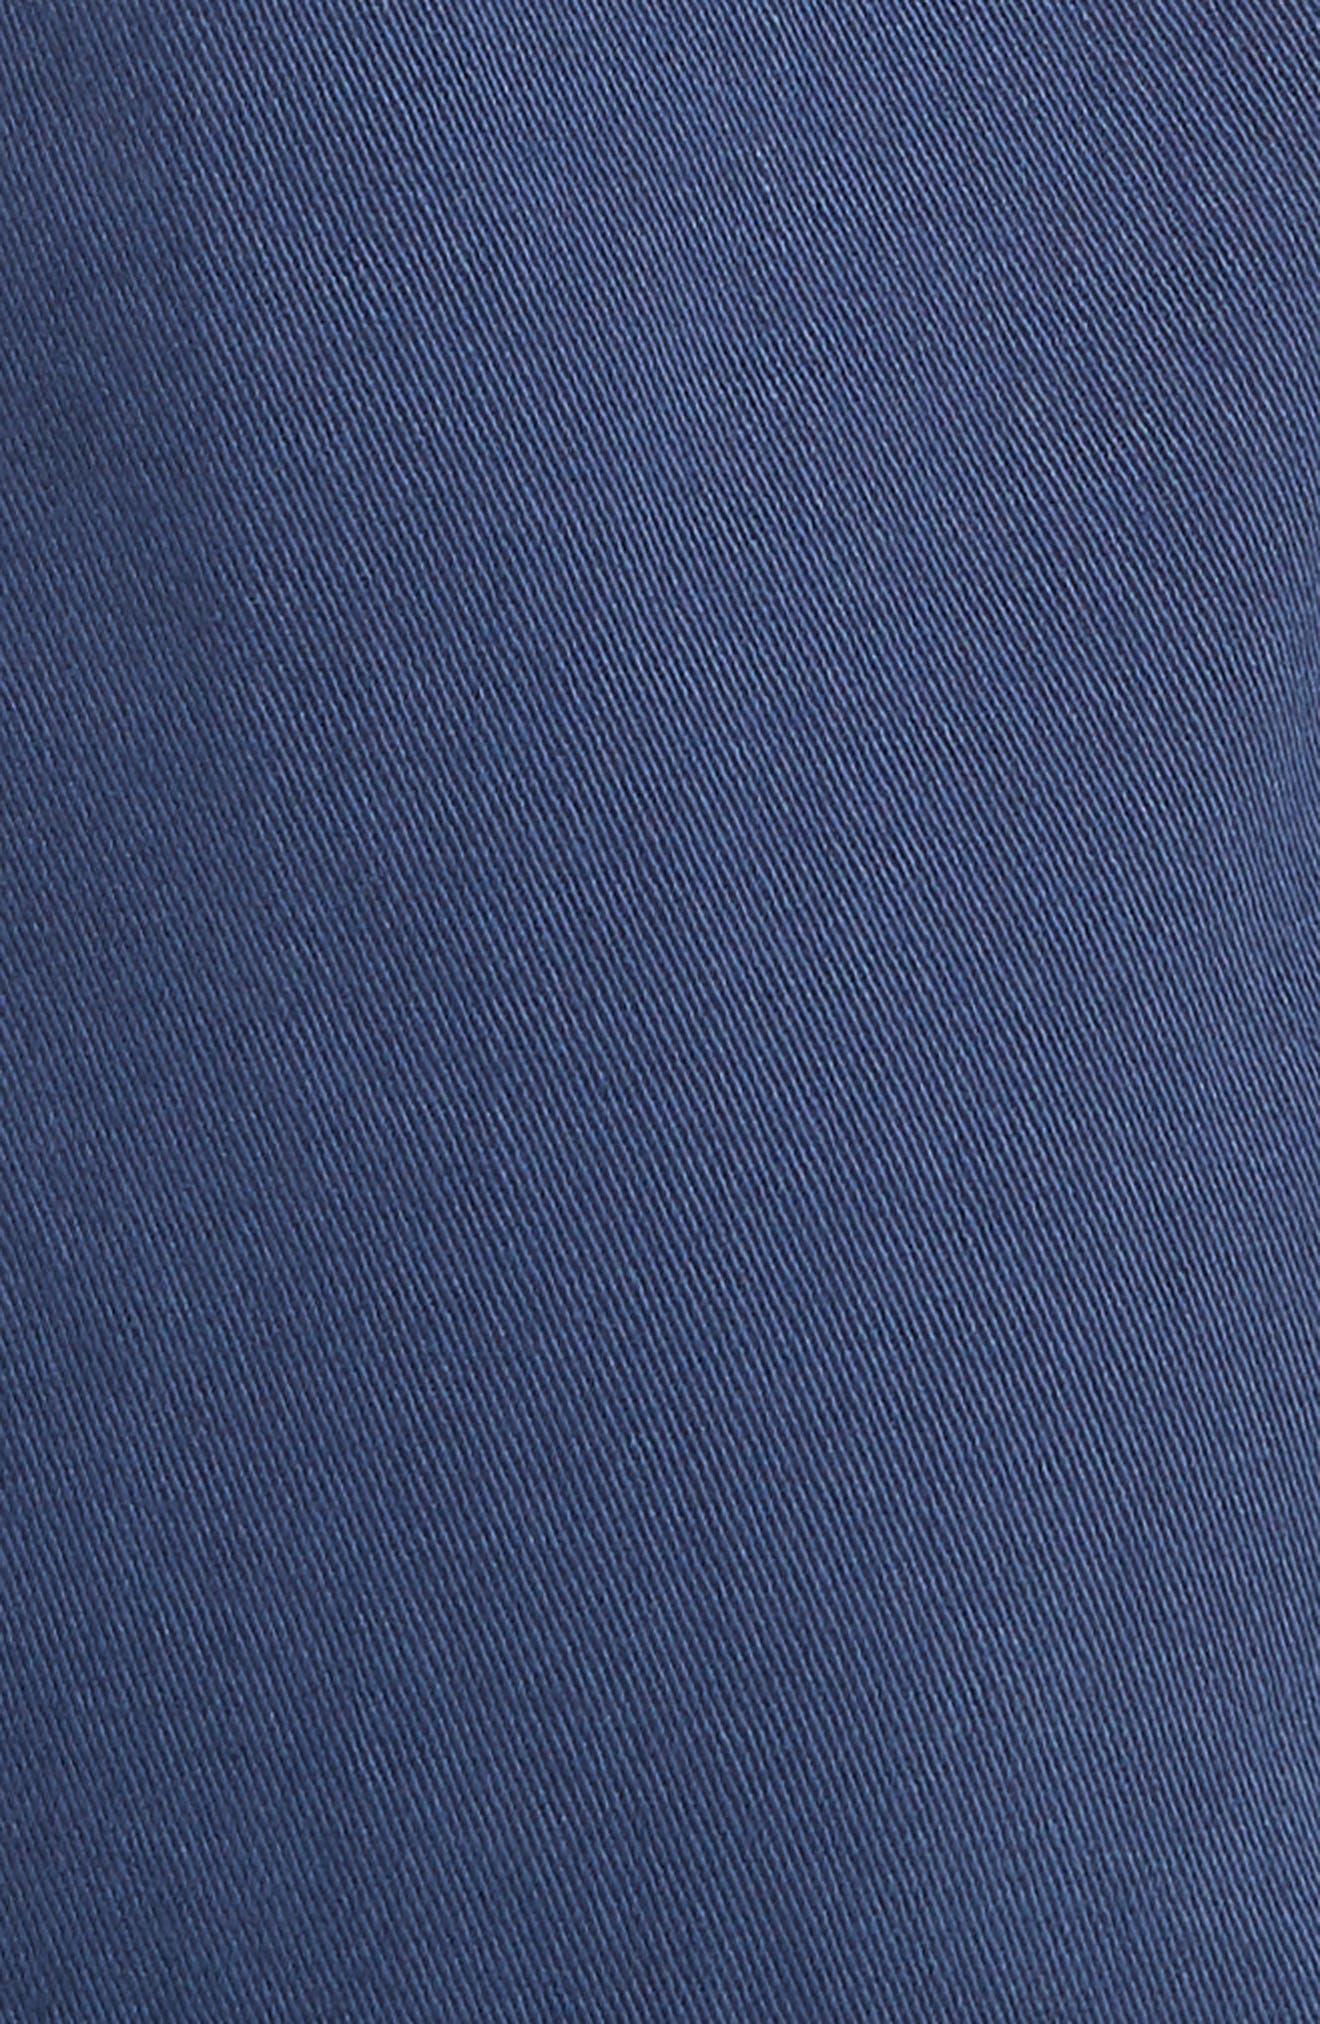 Jeans Co. Regent Relaxed Straight Leg Jeans,                             Alternate thumbnail 5, color,                             Blue Twilight